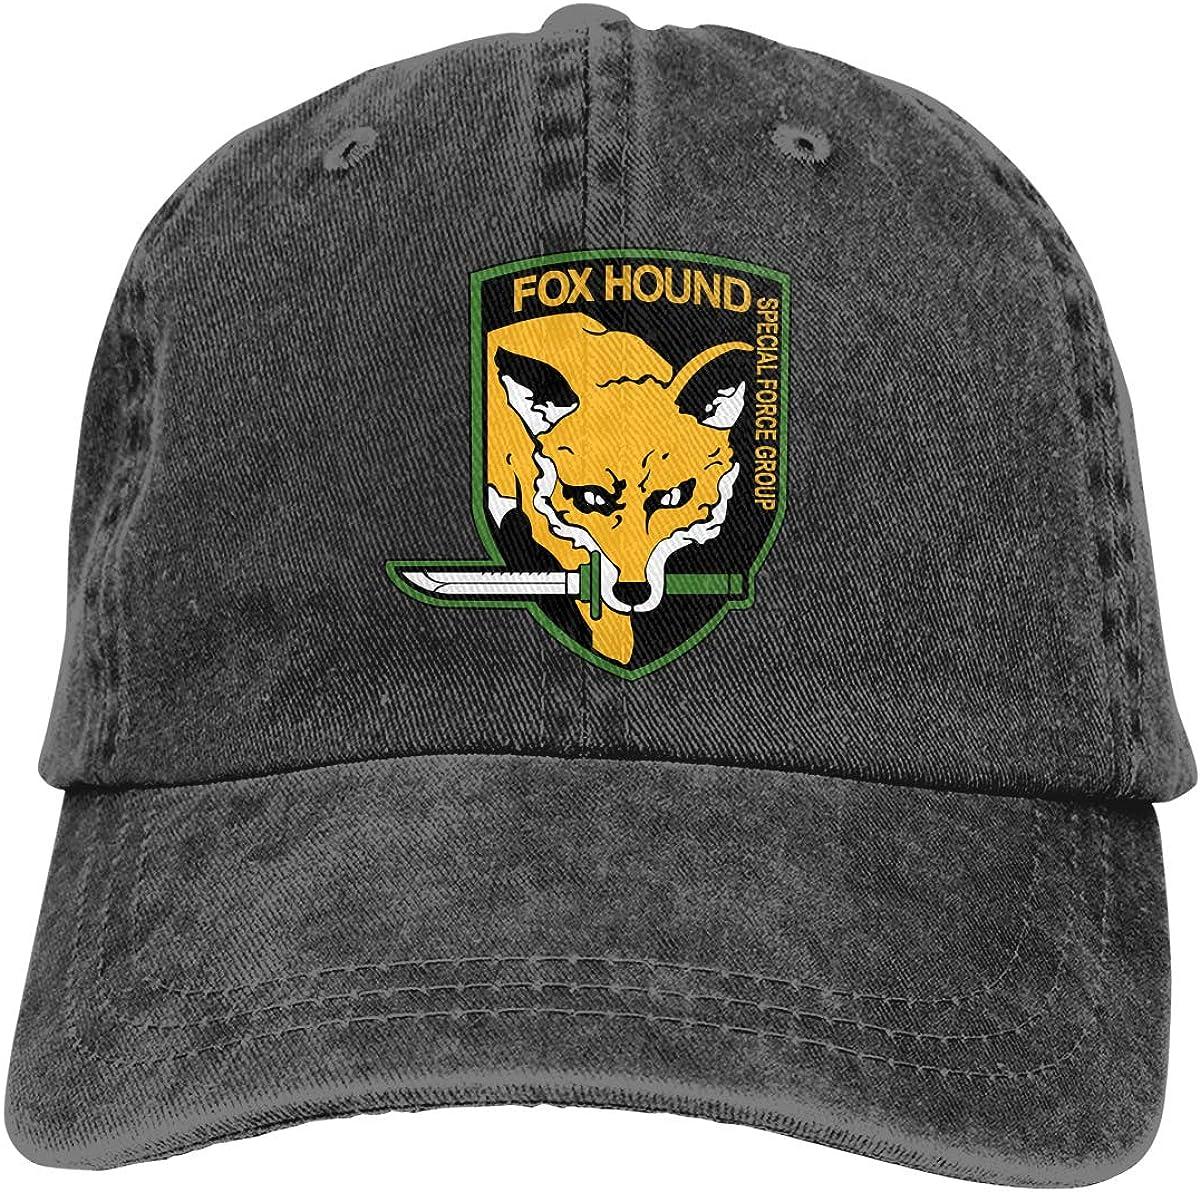 Metal Gear Solid Fox Hound Unisex Classic Comfortable Hat Adjustable Cycling Headgear